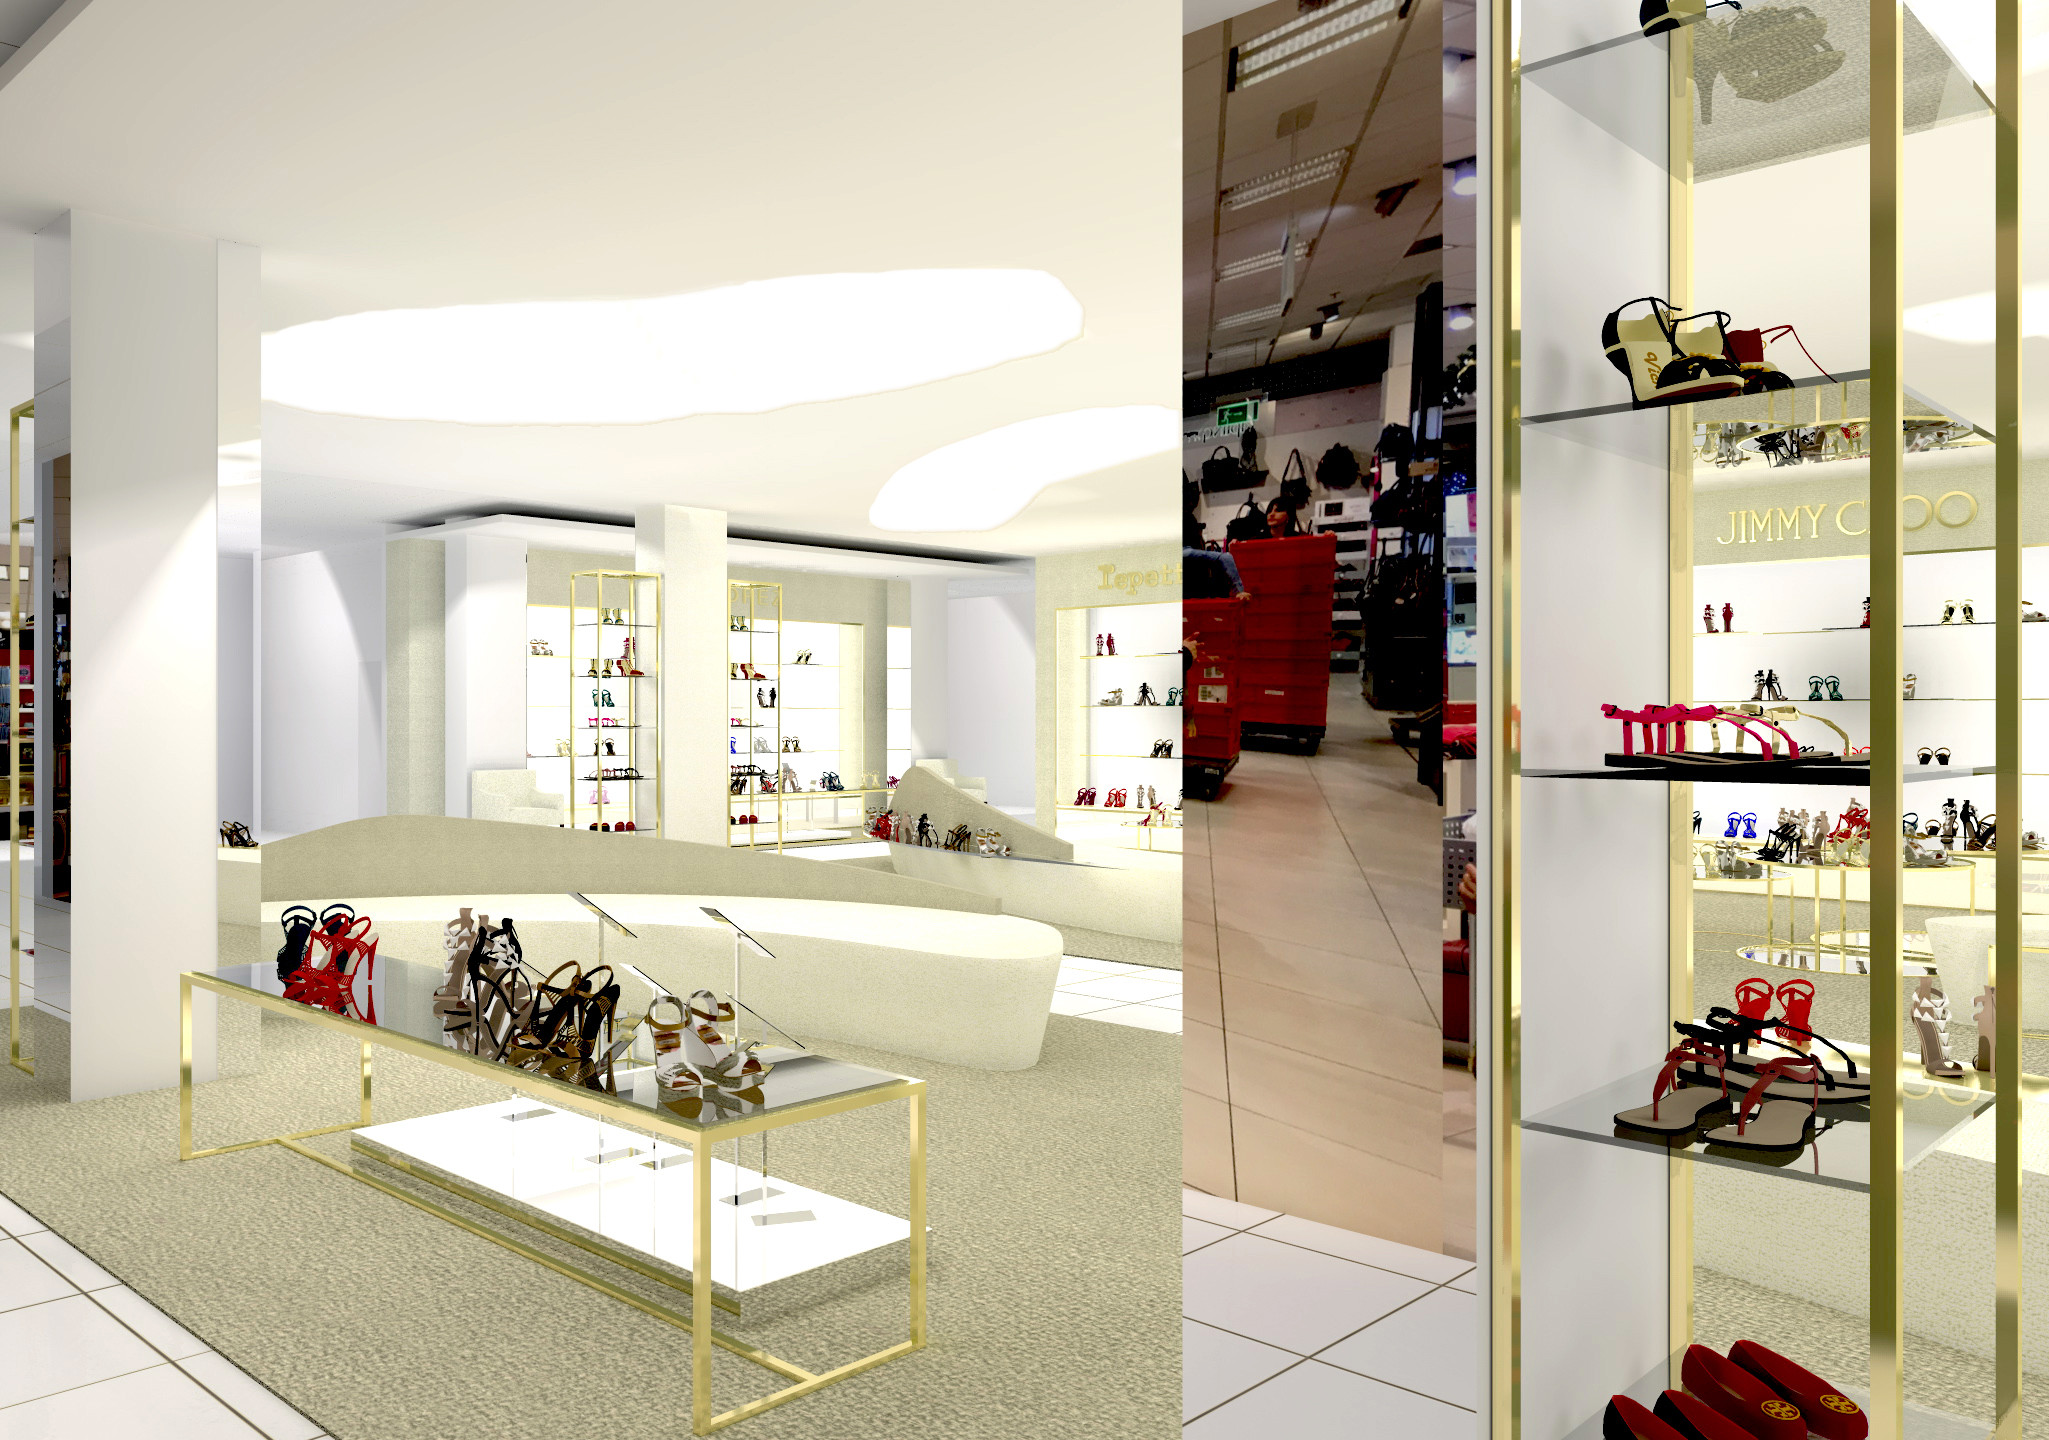 Concept Store L&++ 06